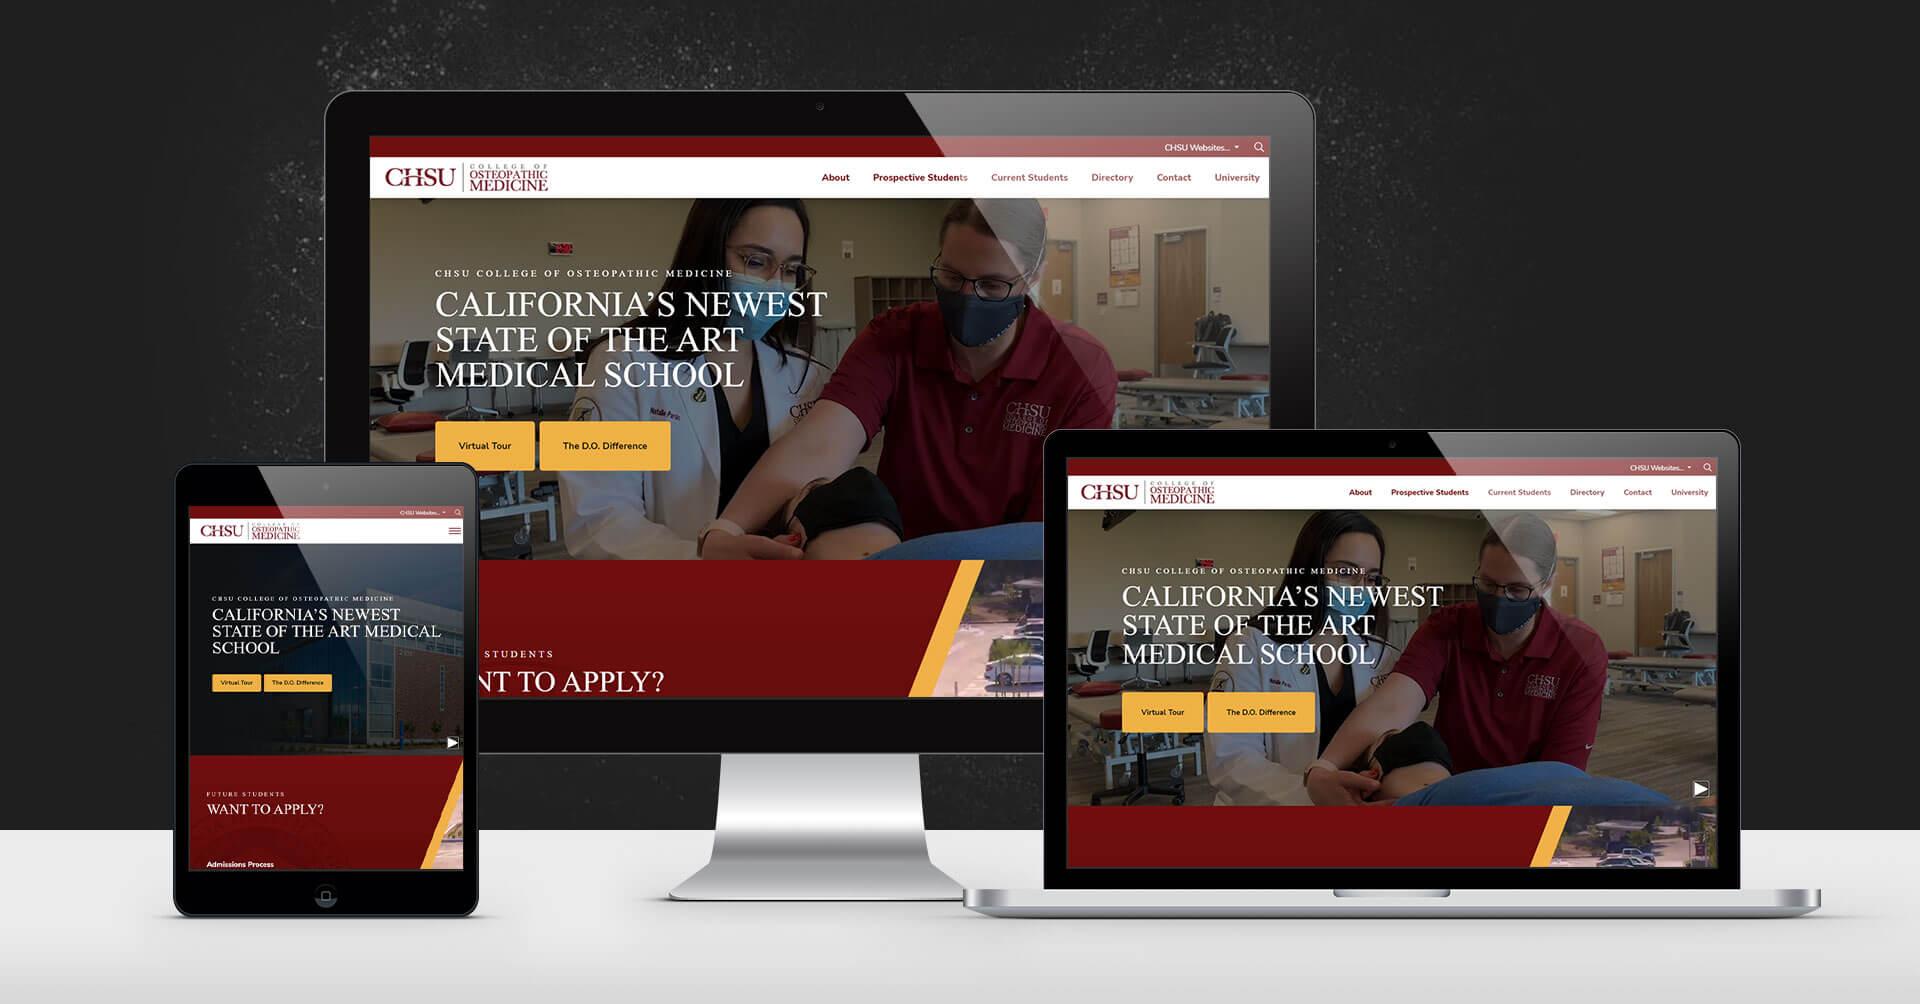 portfolio digital attic chsu college of osteopathic medicine device images